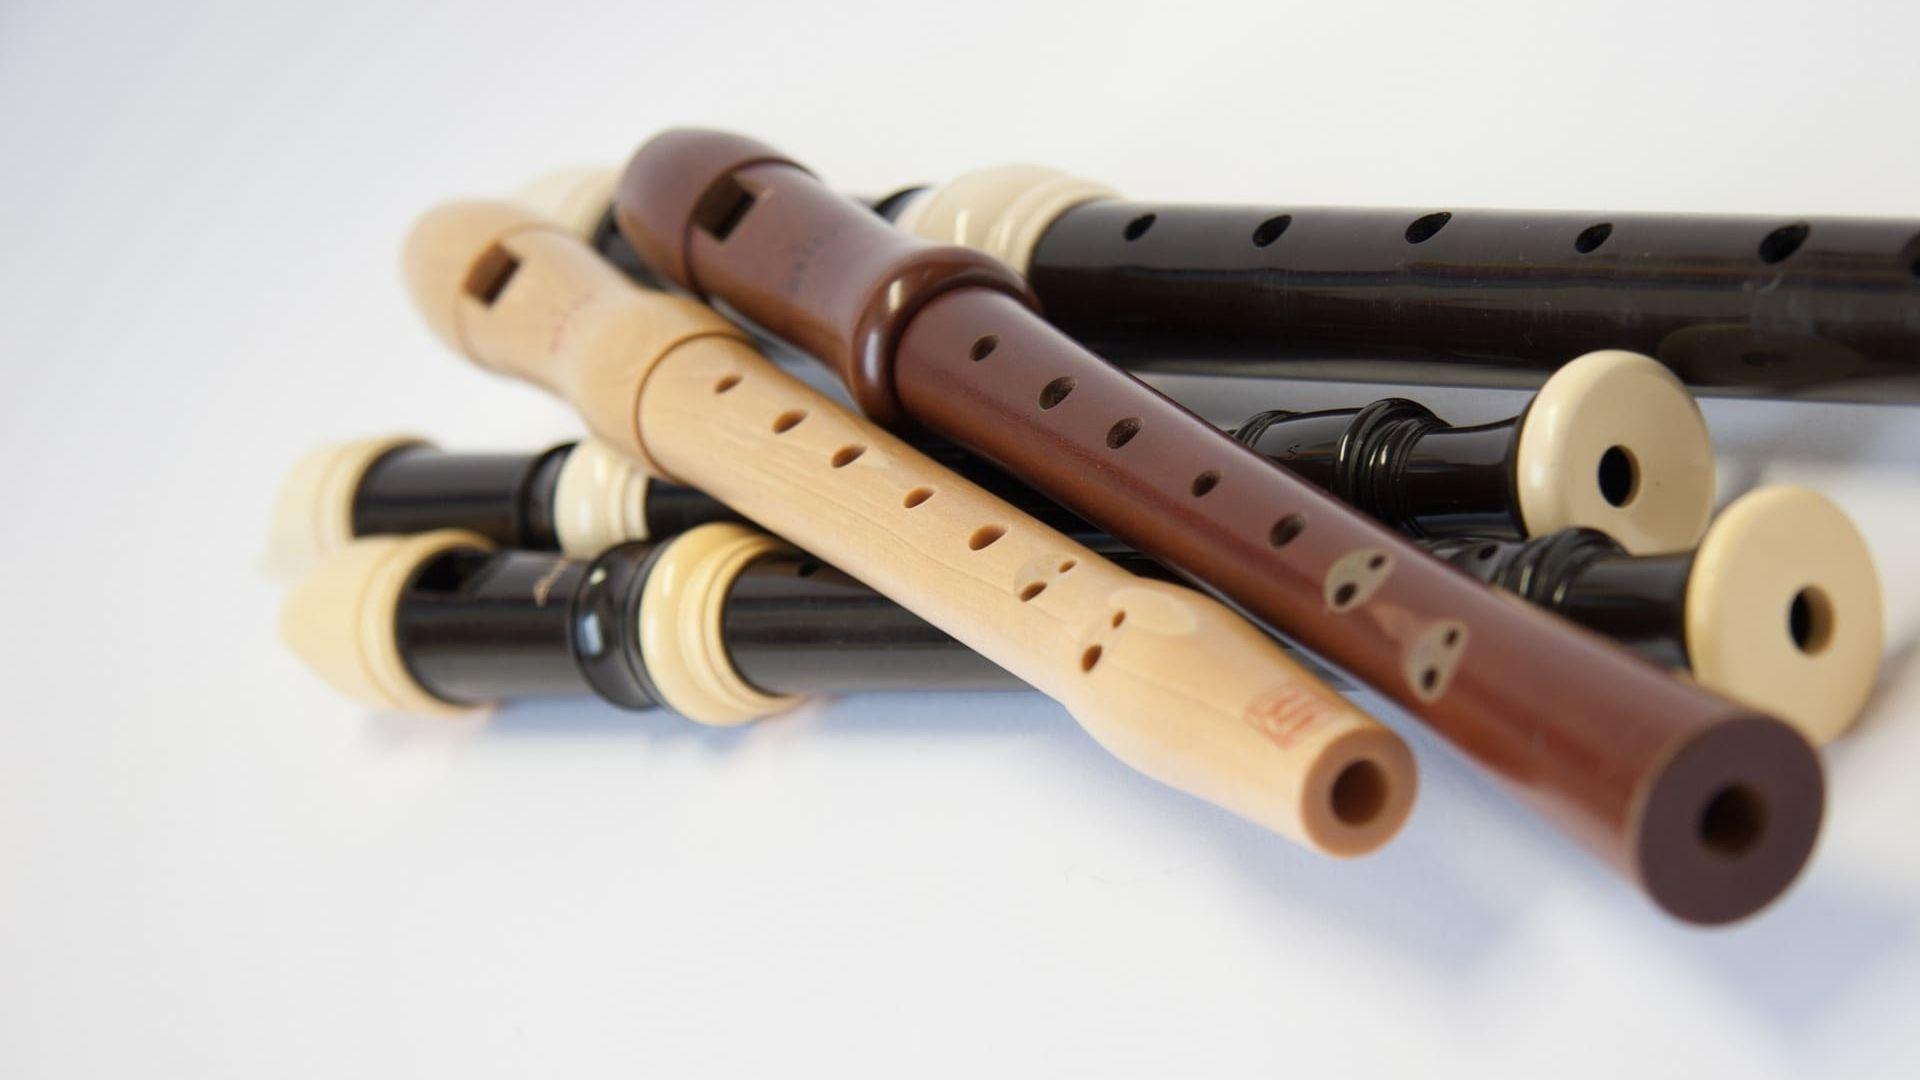 arte allegro - flauta dulce - escuela de musica - online - tips